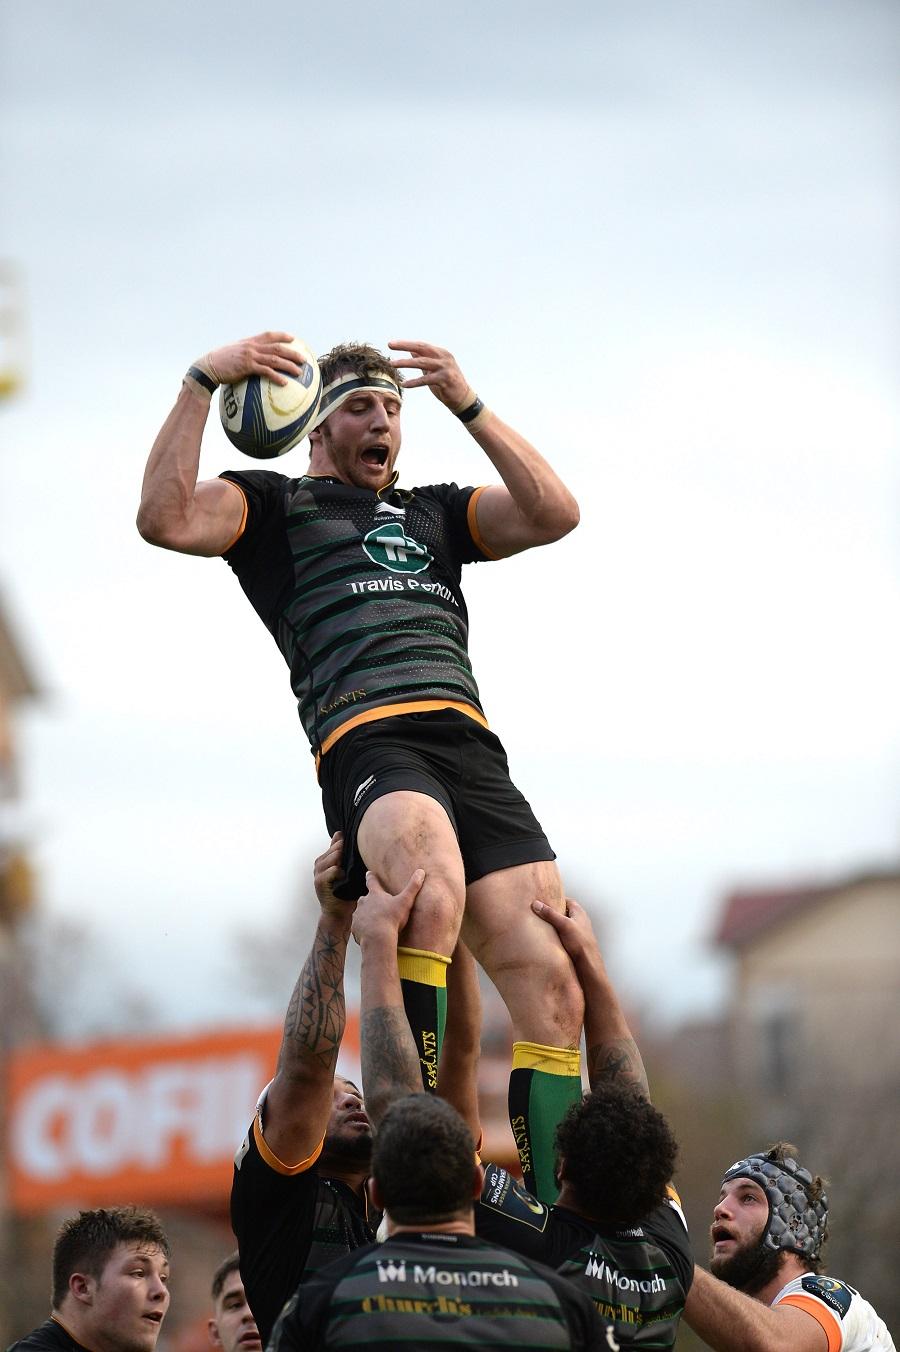 Northampton's Tom Wood rides high against Treviso